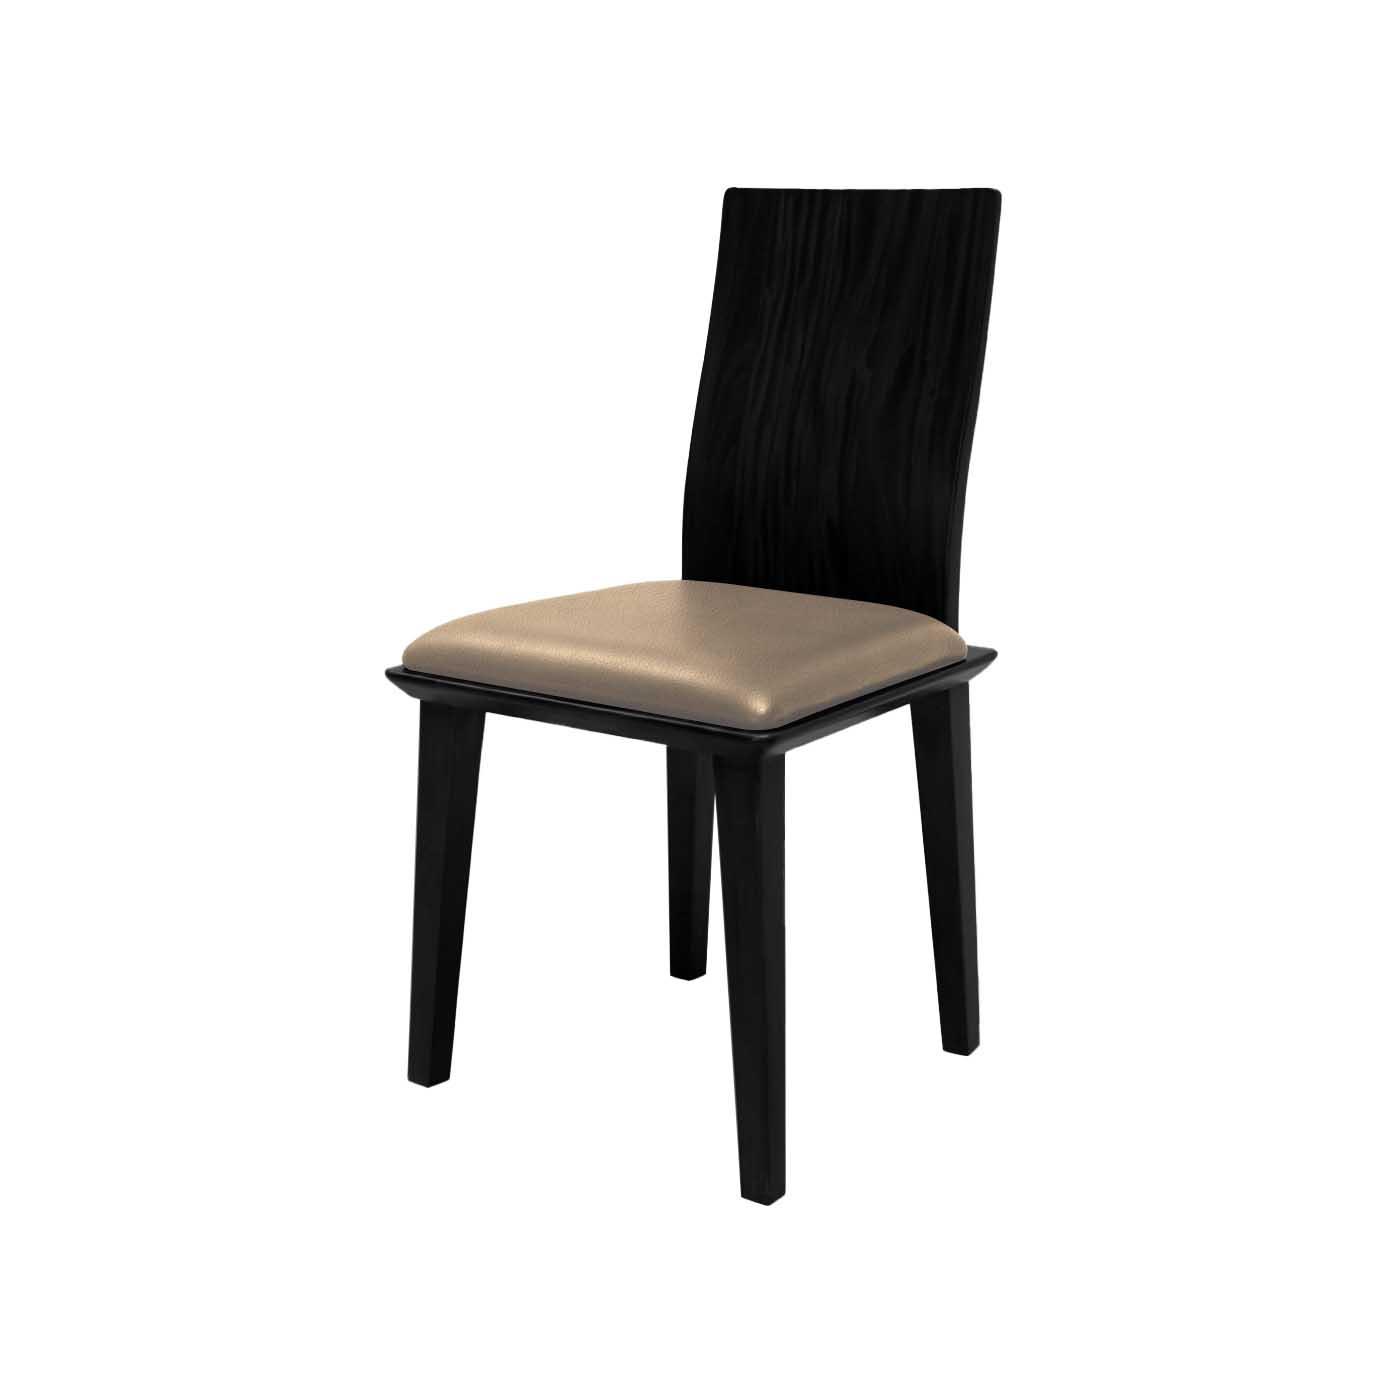 Mukō Tan Black Chair